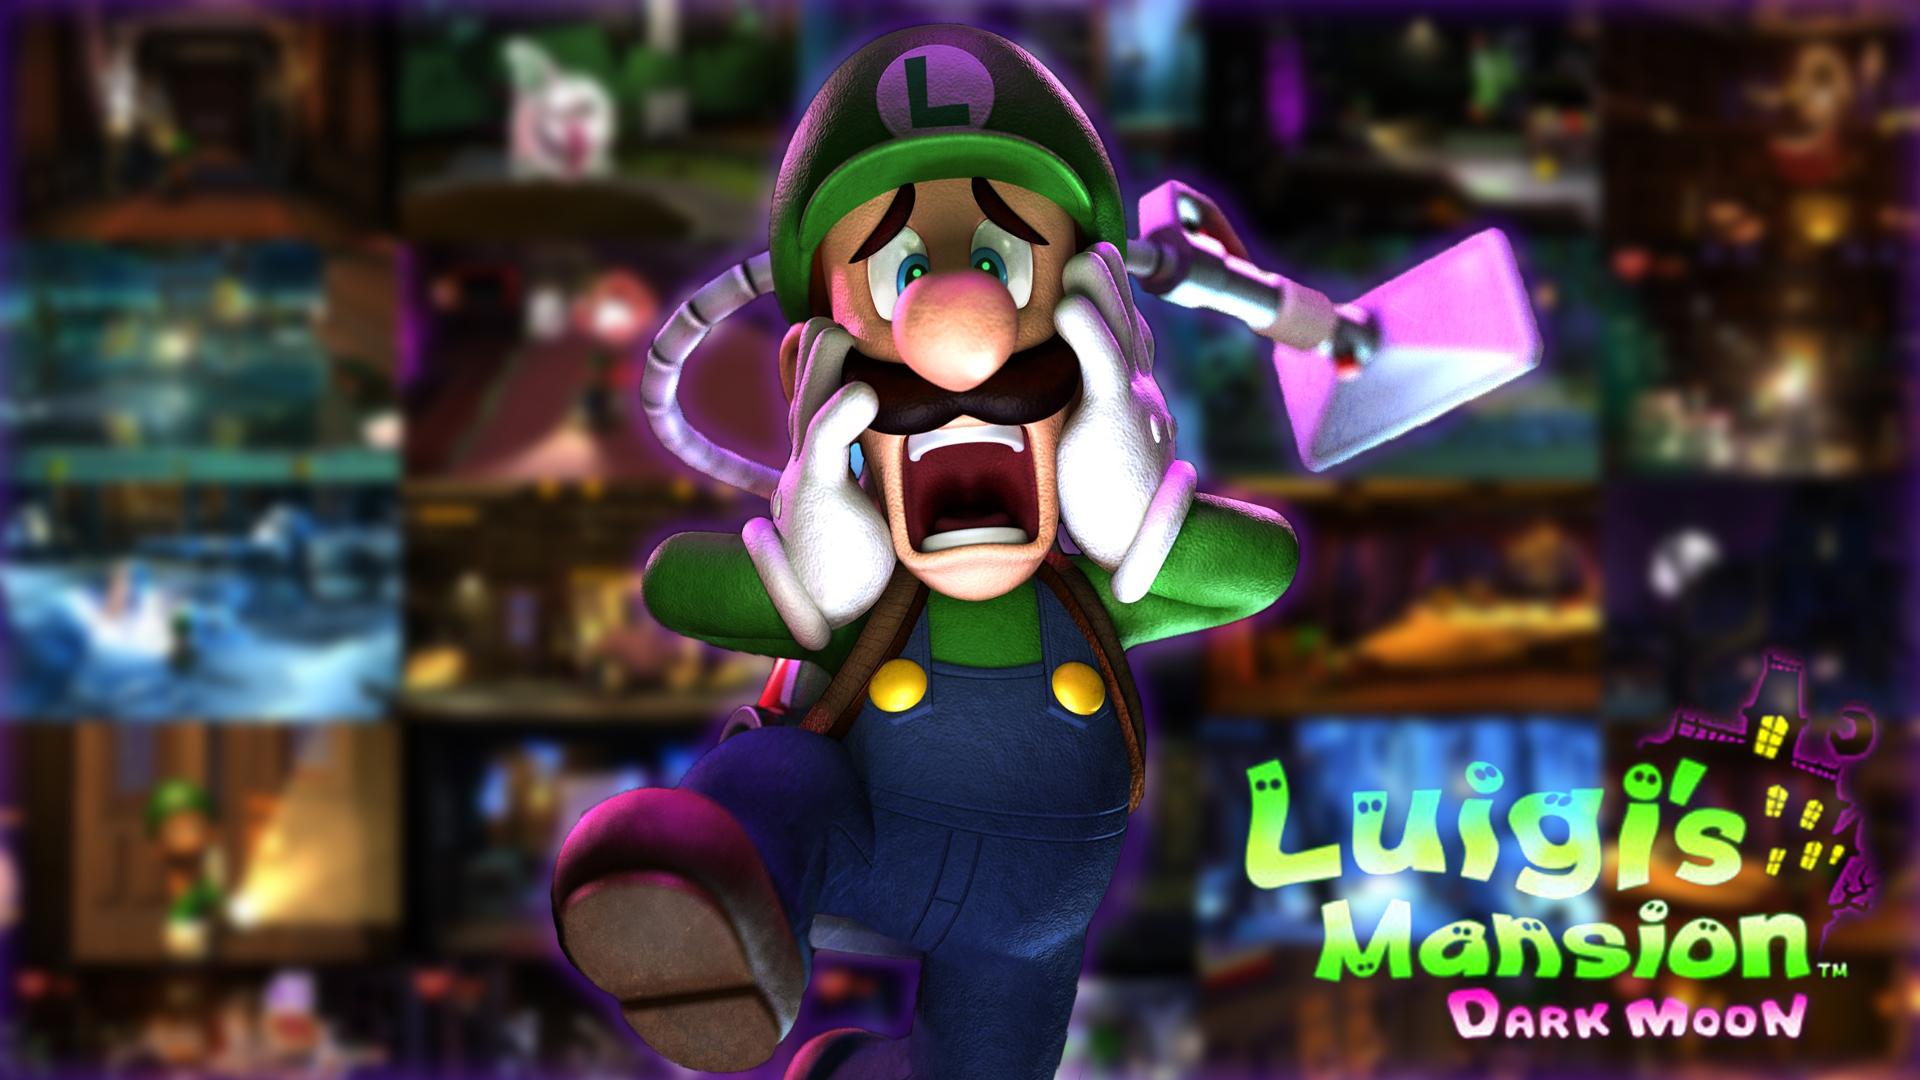 HD Wallpaper | Background Image ID:487037. 1920x1080 Video Game Luigi's Mansion